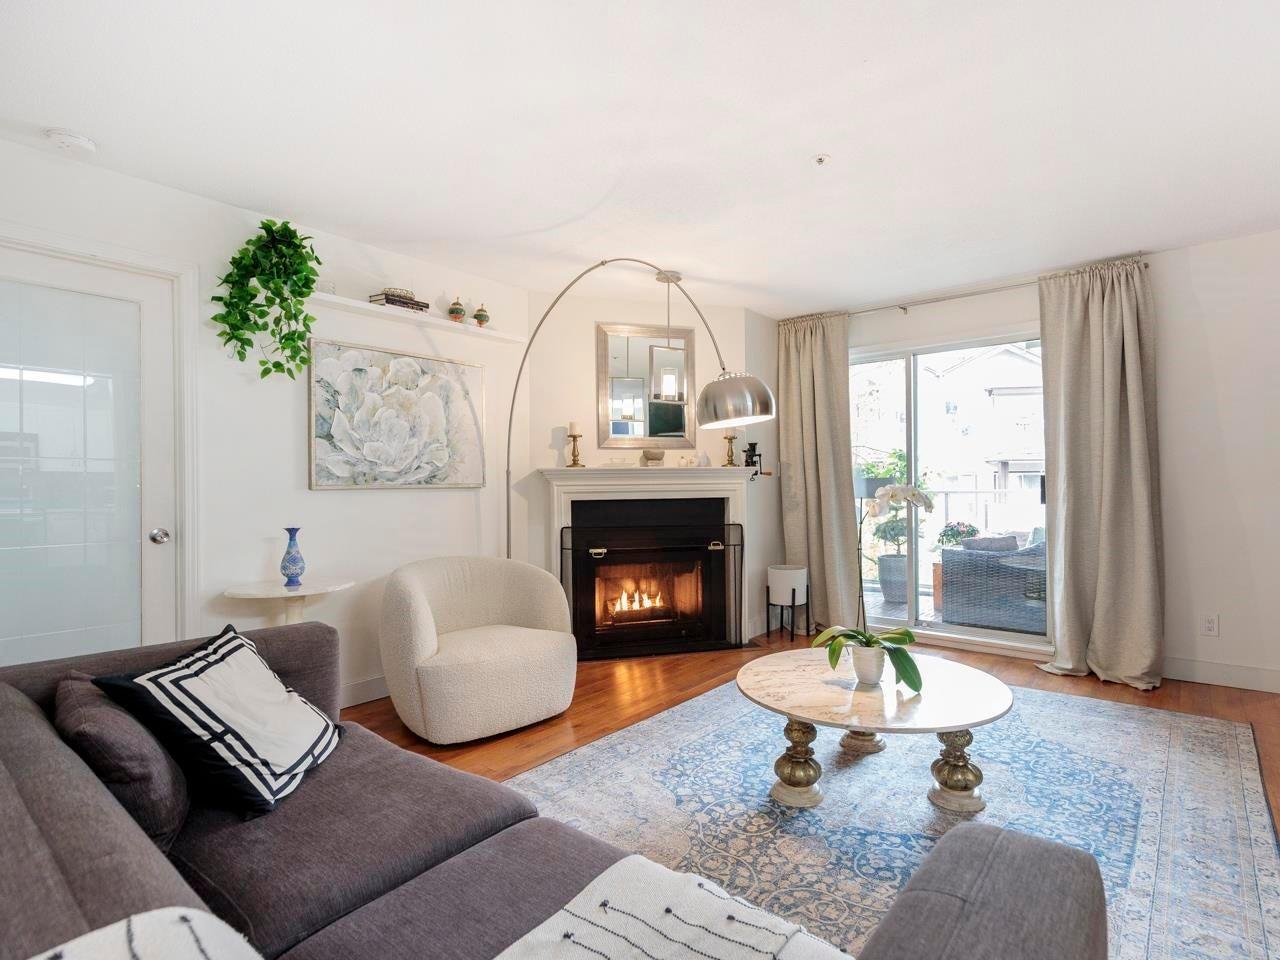 301 3680 RAE AVENUE - Collingwood VE Apartment/Condo for sale, 3 Bedrooms (R2626000) - #1